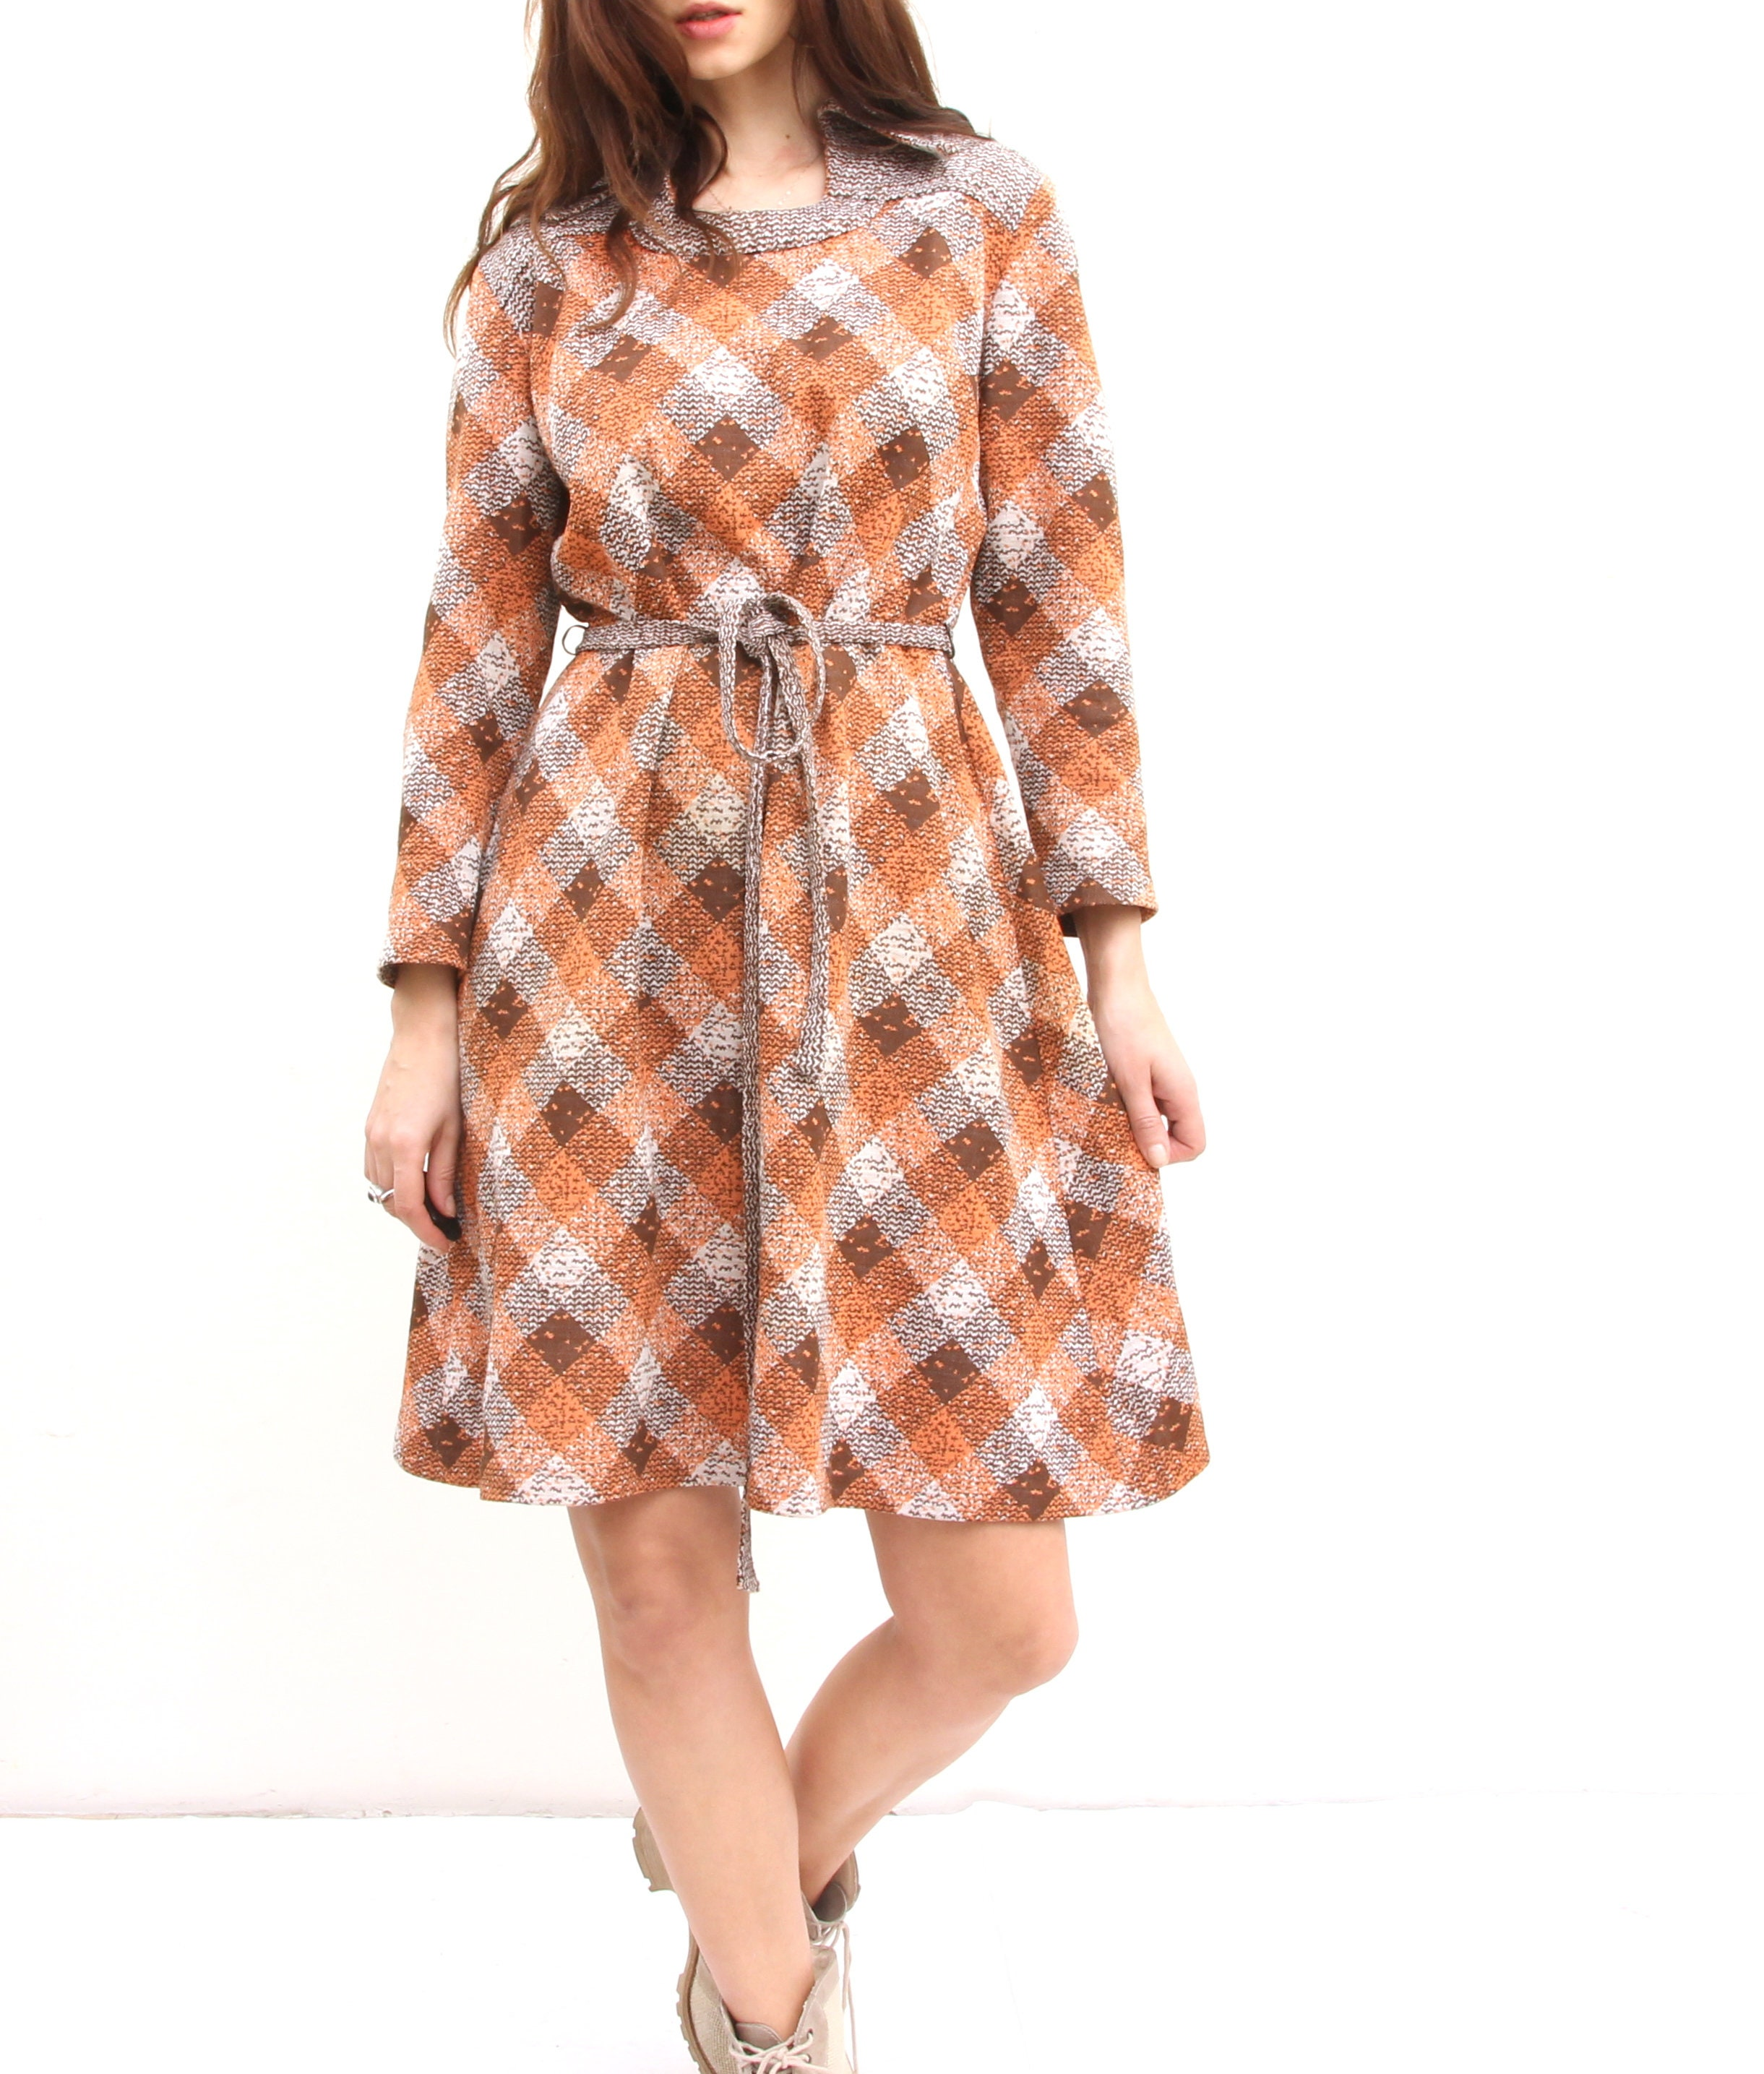 70s Geometric Print Waisted Dress Wing Collar Long Sleeve The Knee Length Dress M